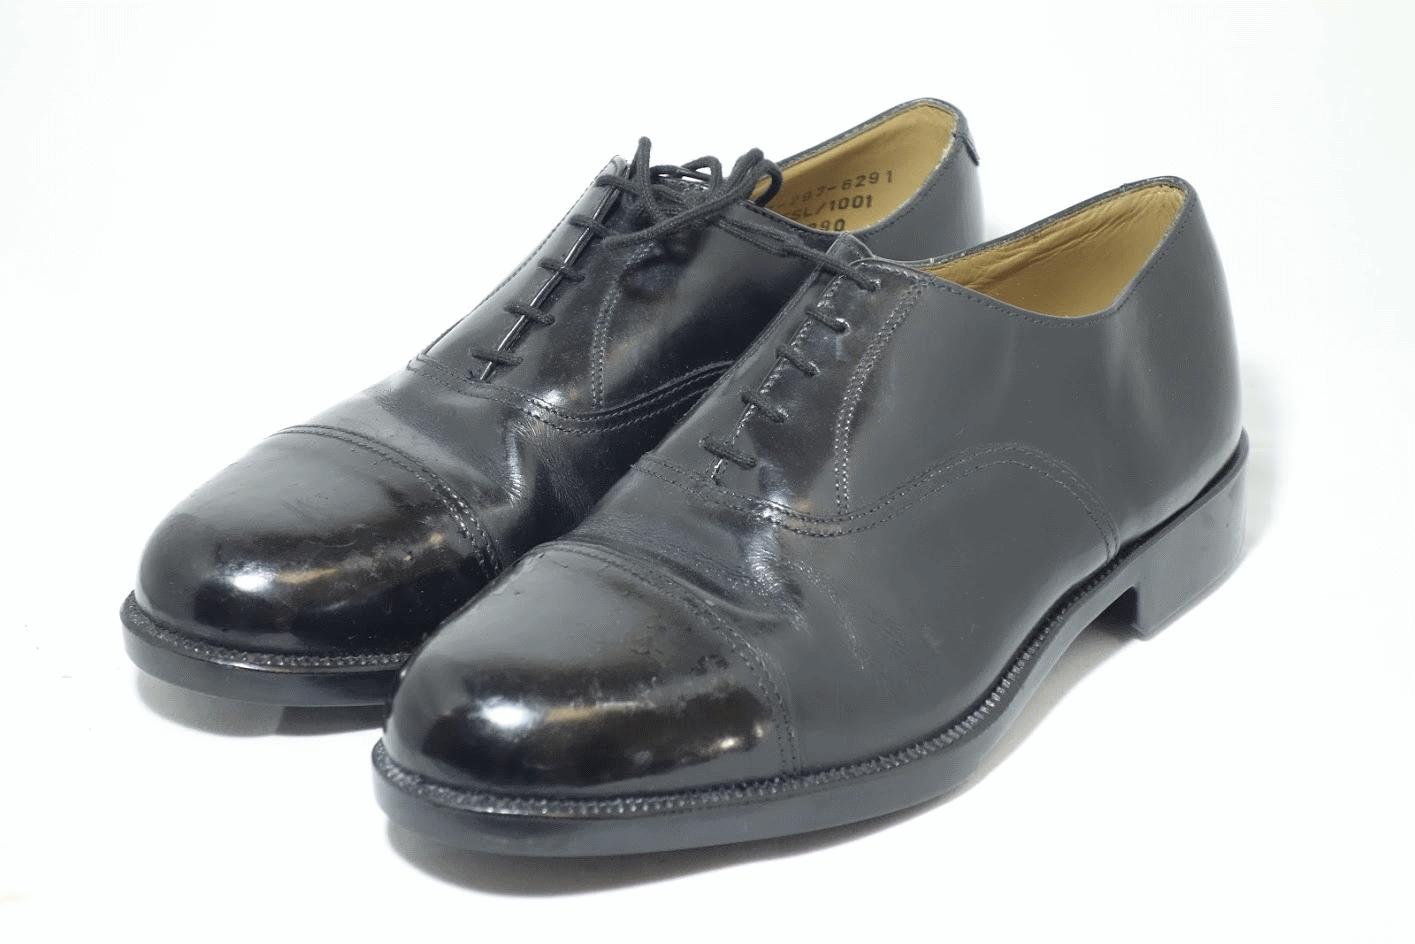 British army surplus black leather